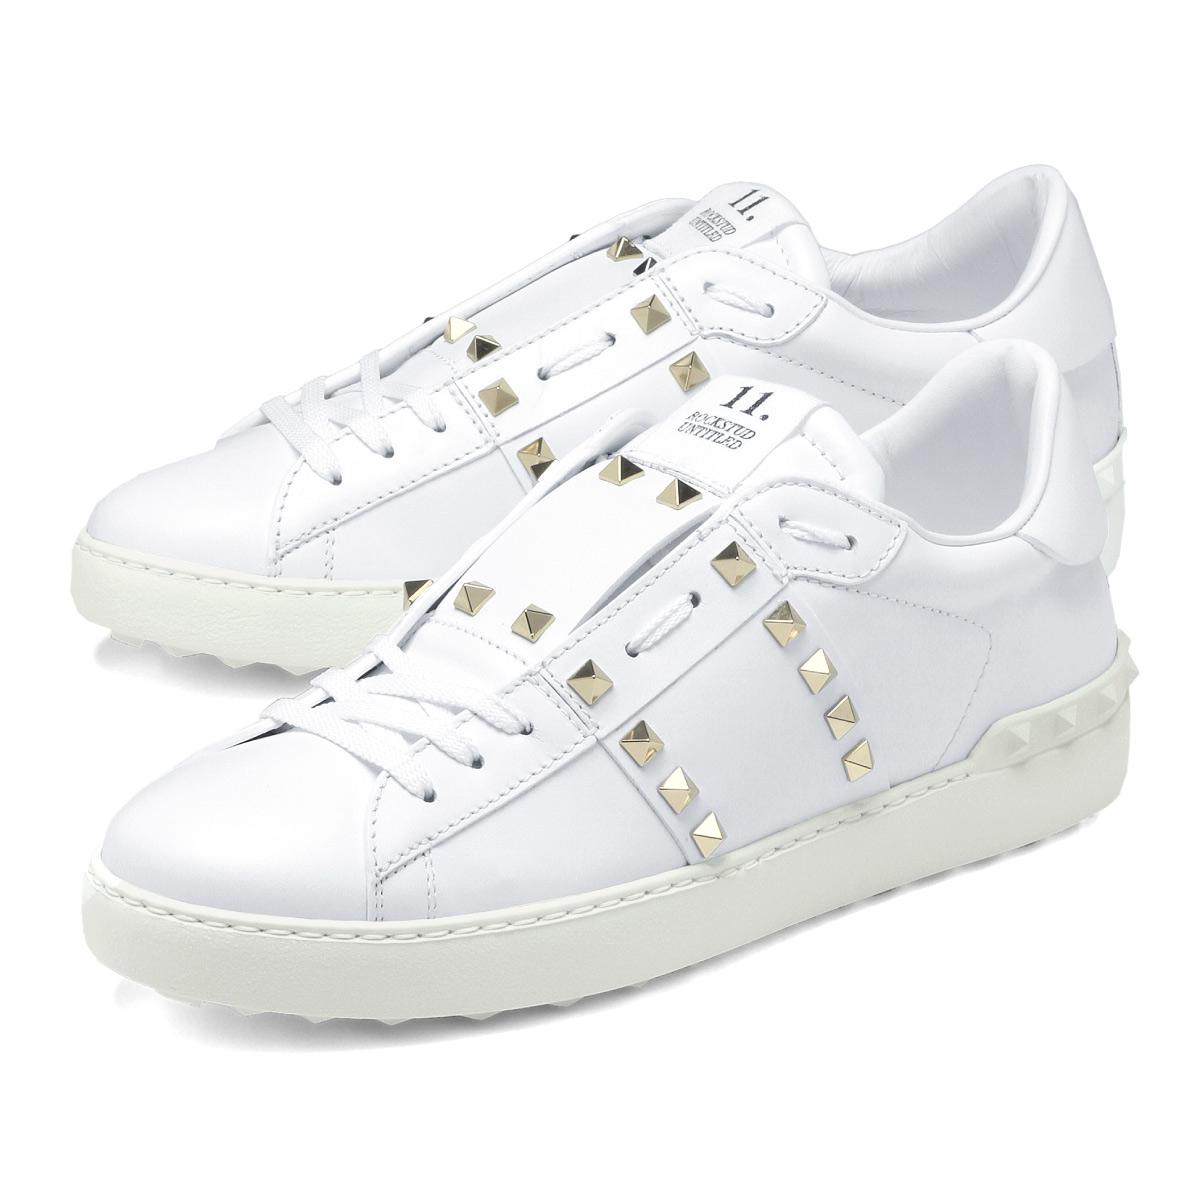 Importshopdouble Valentino Valentino Shoes Men Py0s0931 Bhs 0bo No